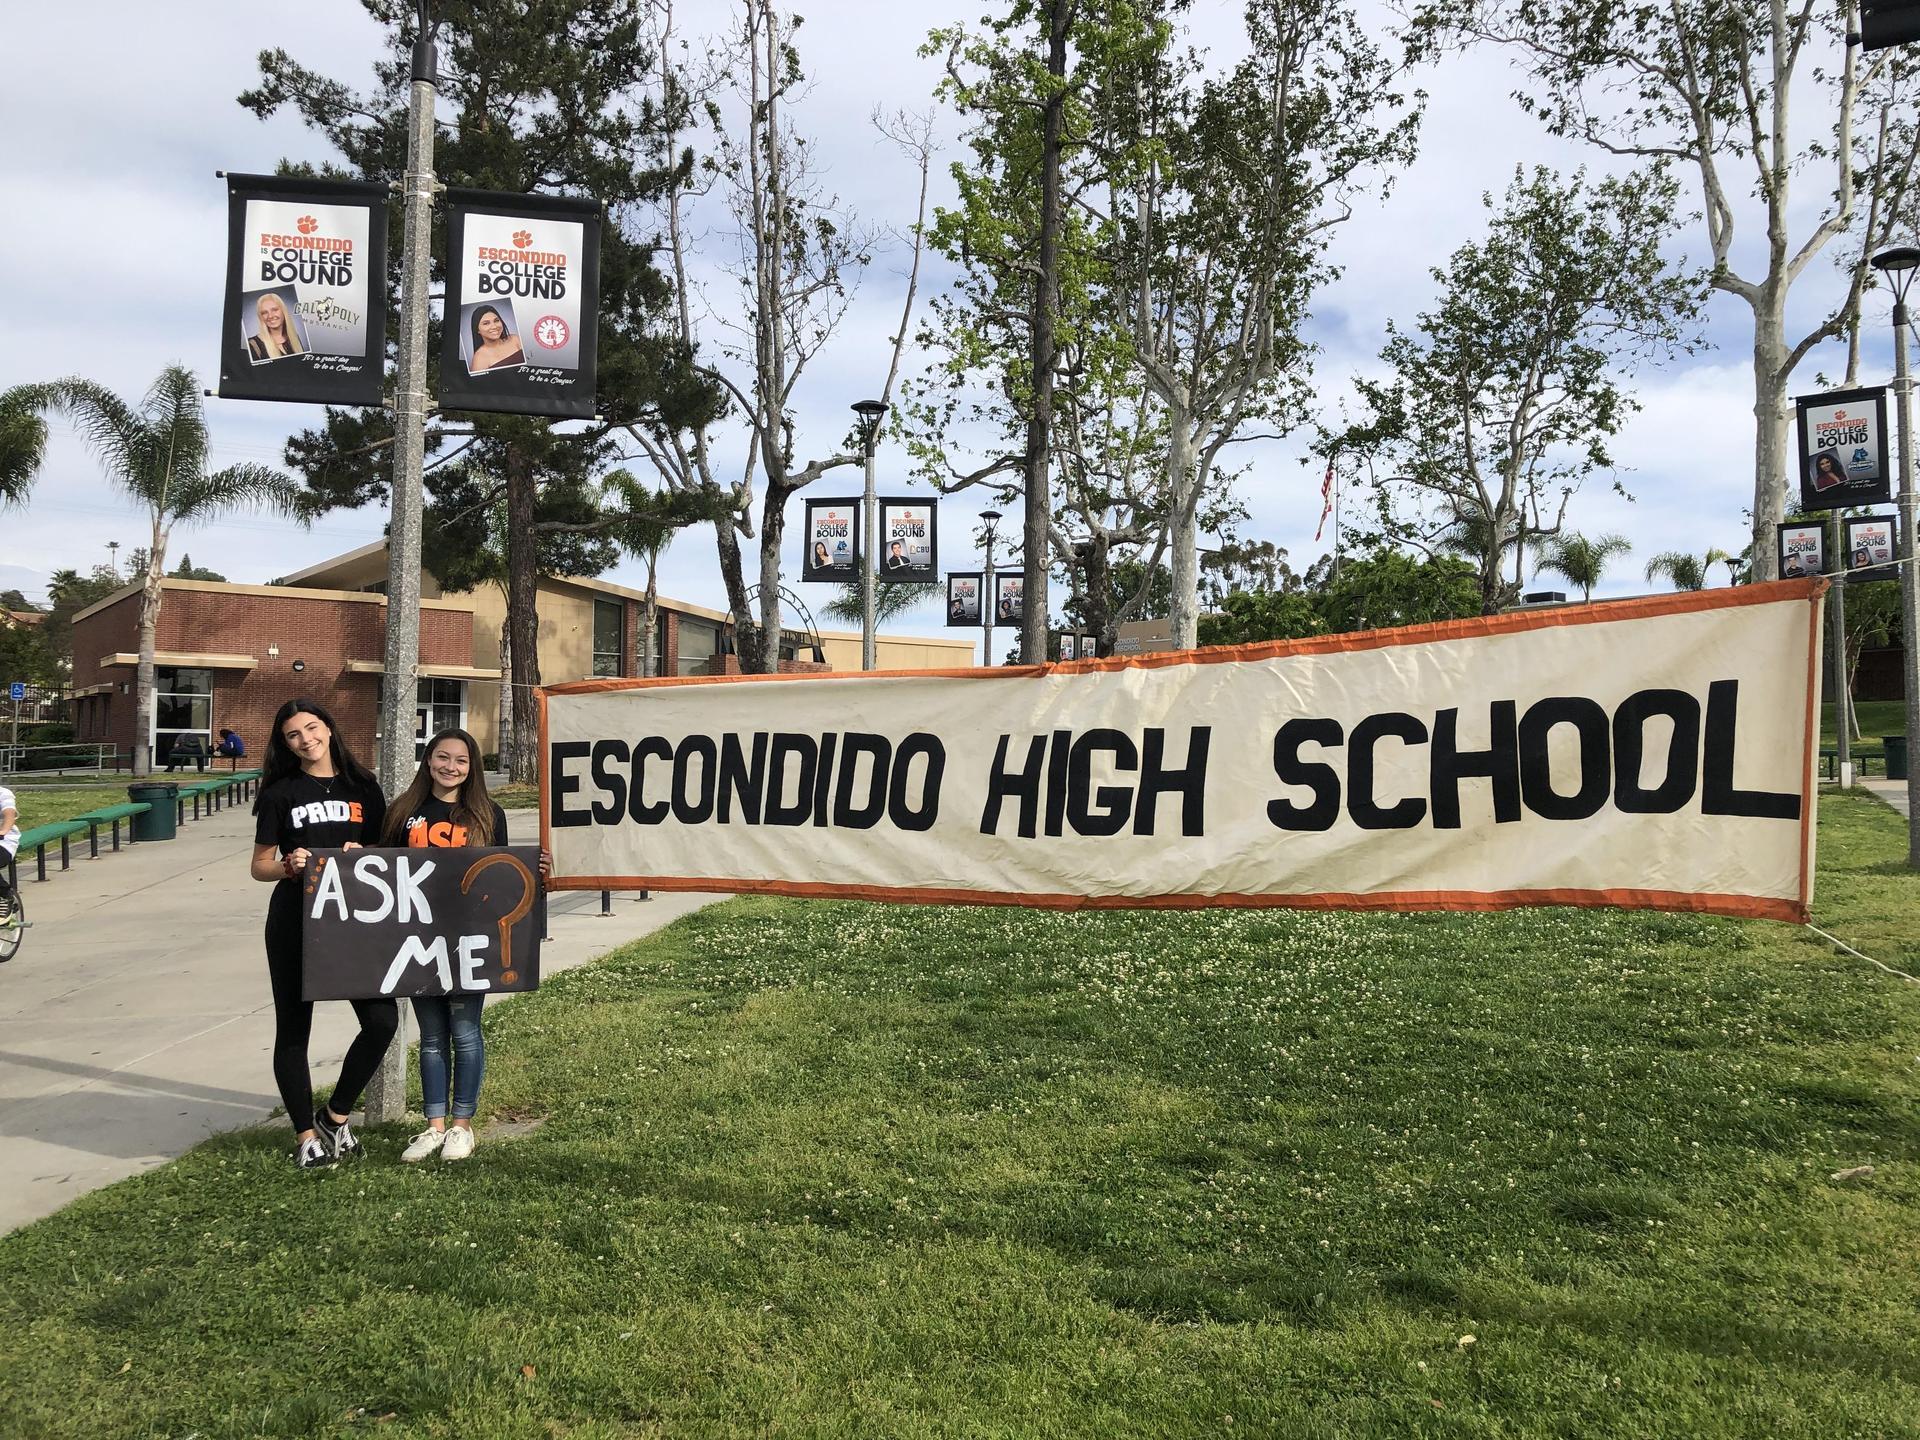 Welcome to Escondido High School!!